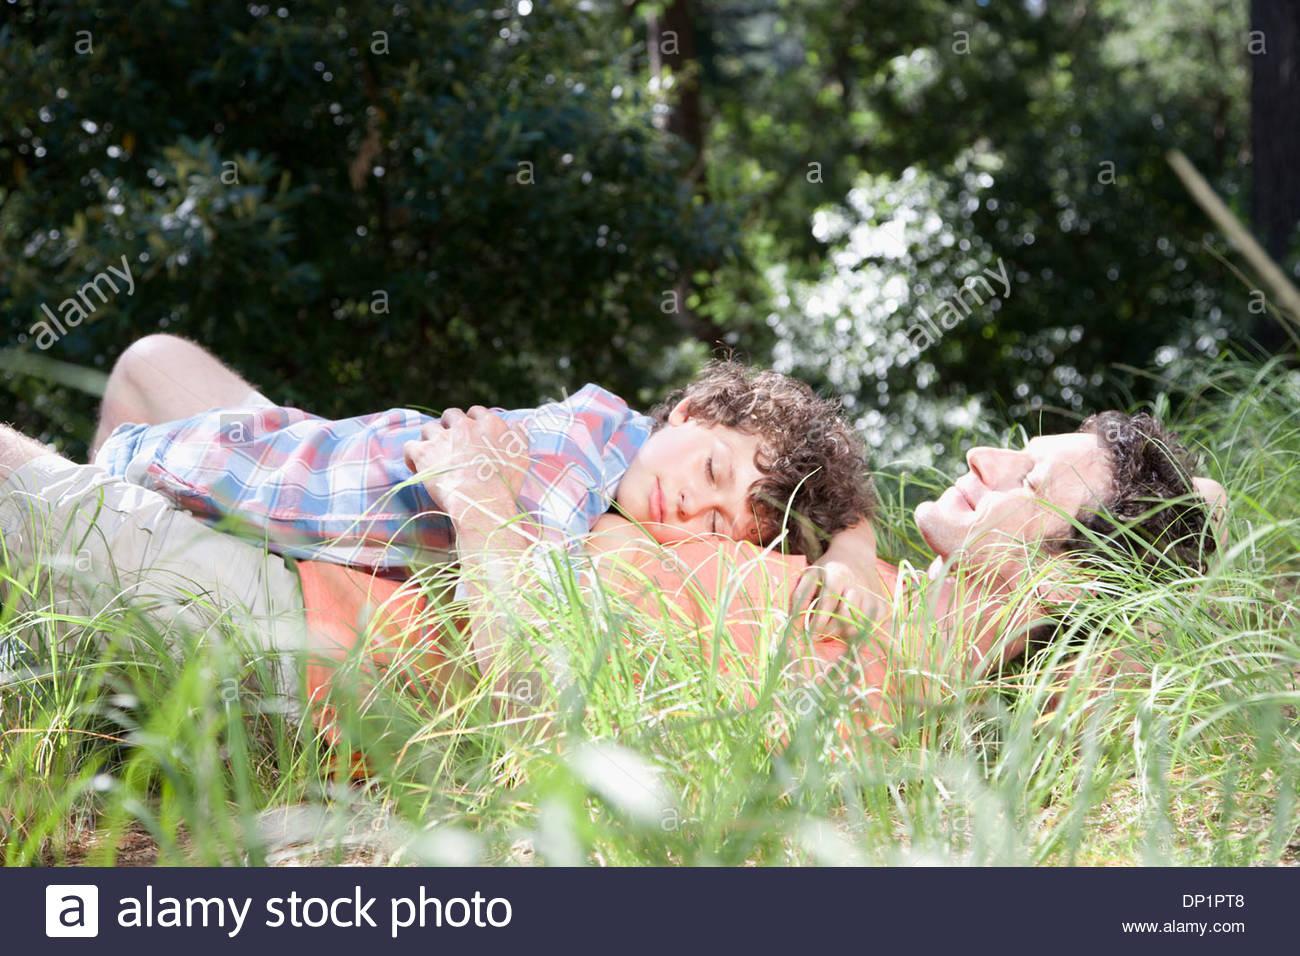 Vater und Sohn schlafen im Rasen Stockbild